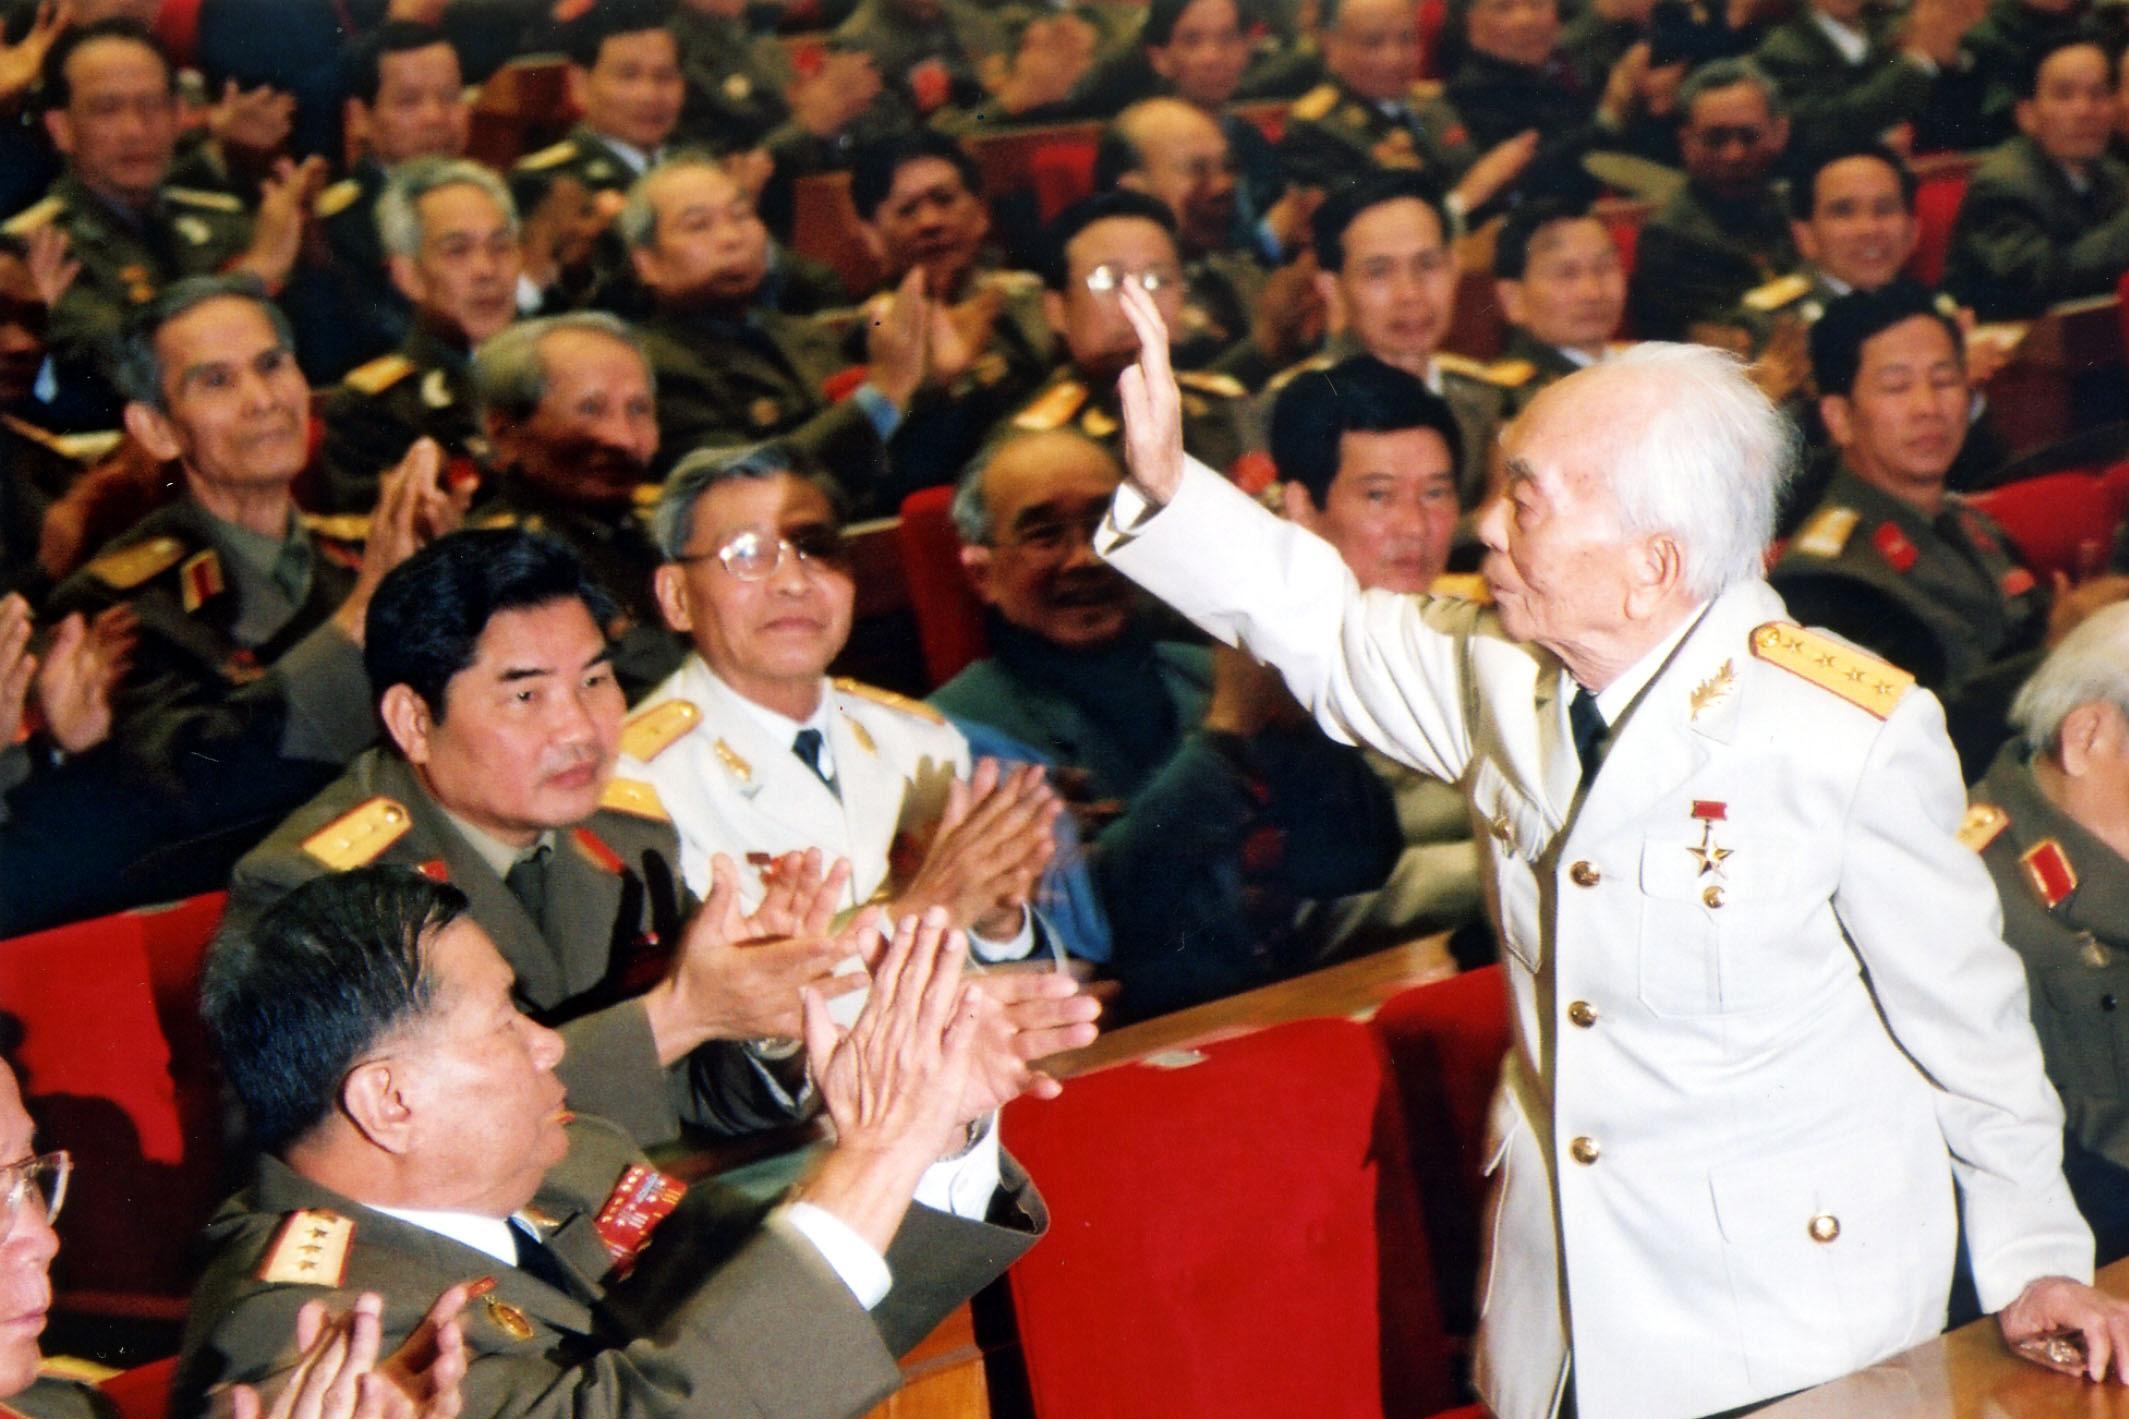 Vietnams Legendary General Giap